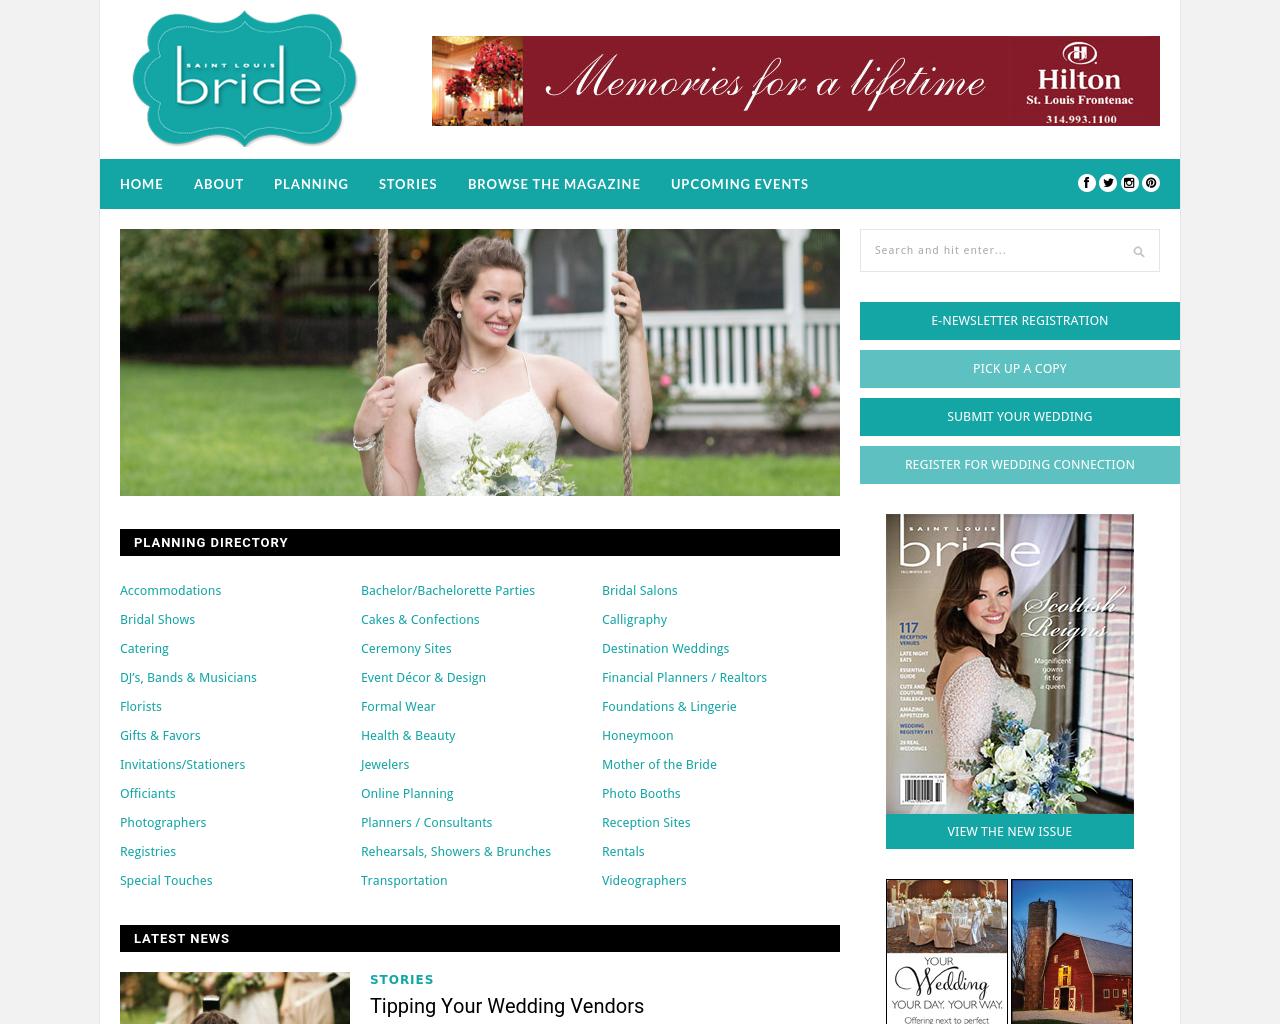 Saint-Louis-Bride-Magazine-Advertising-Reviews-Pricing